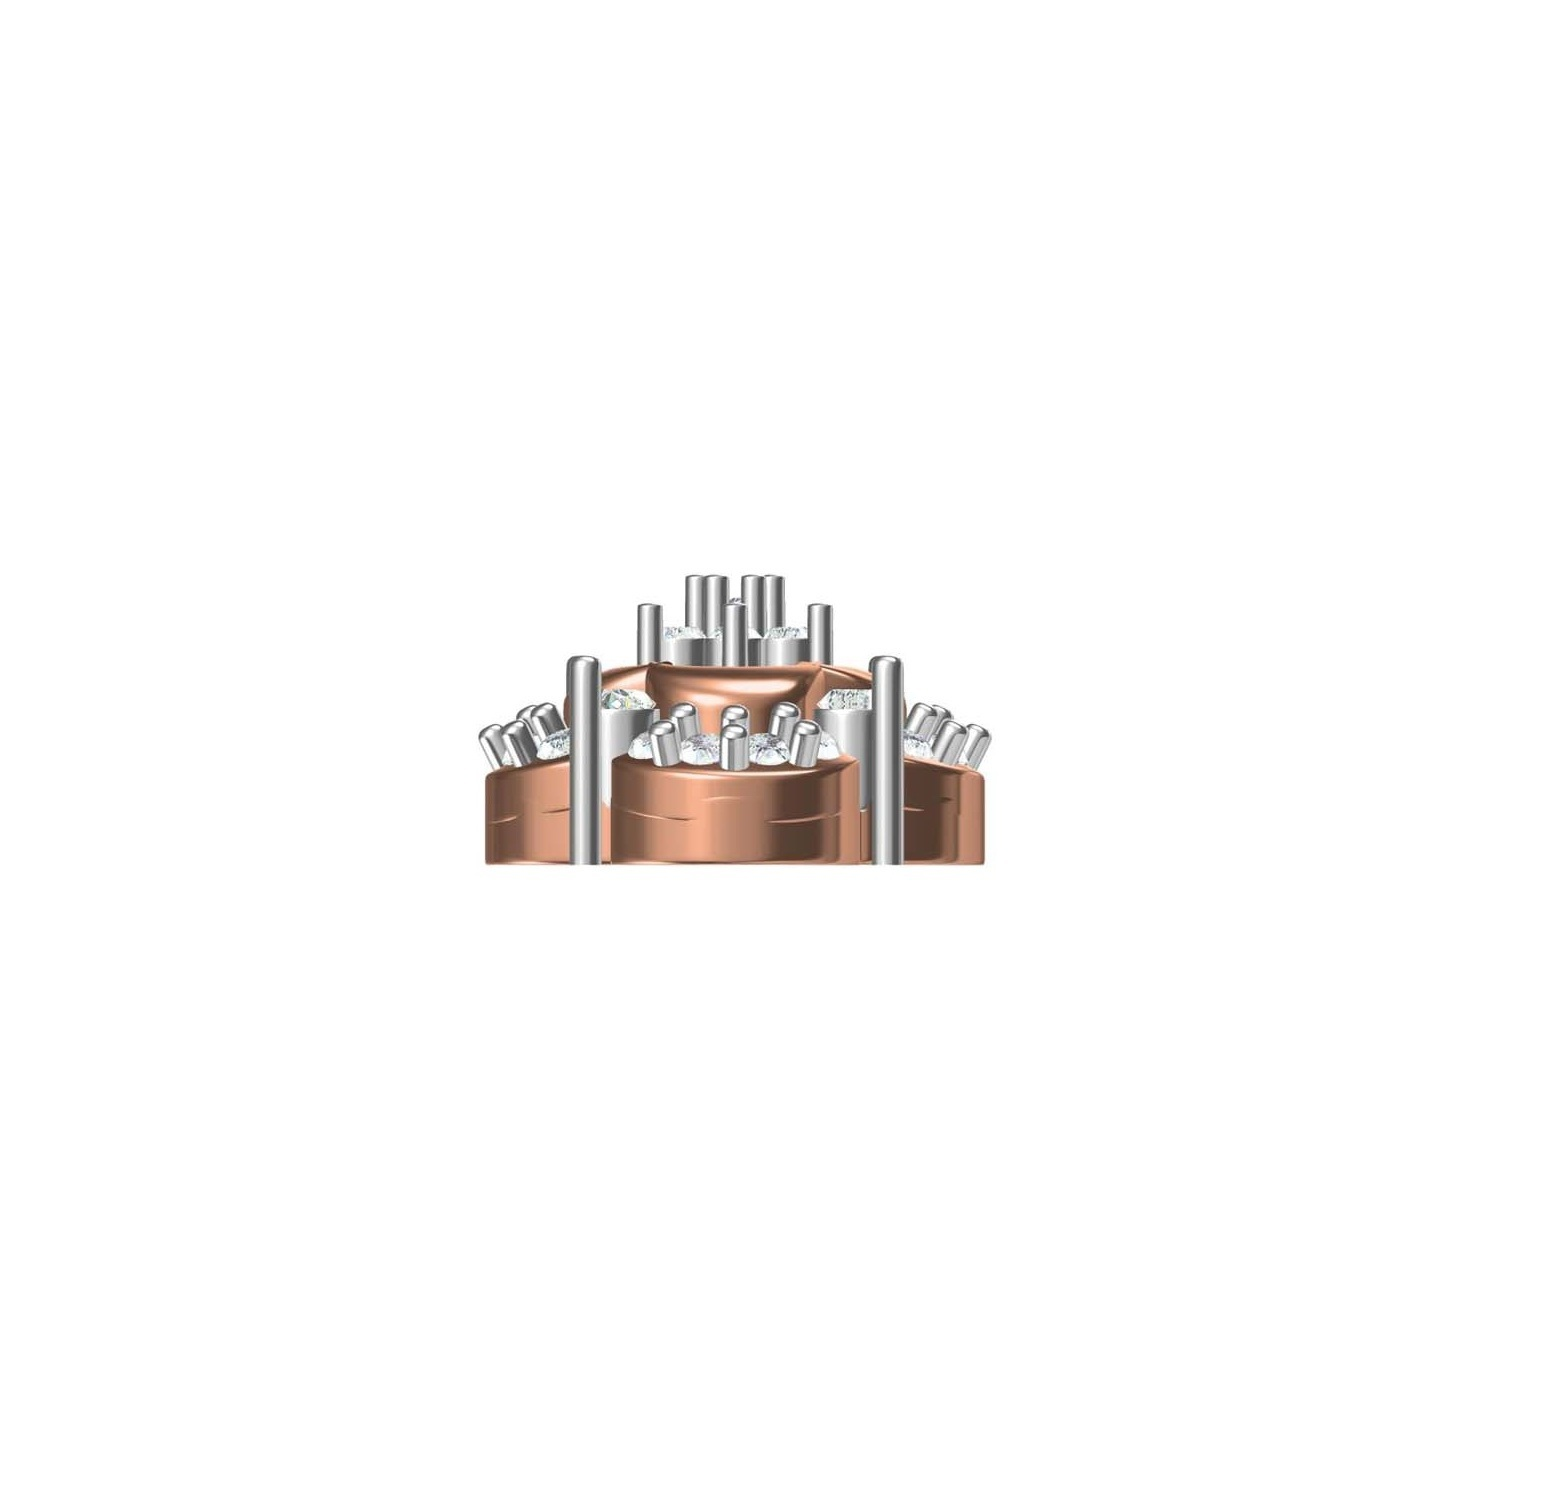 Diamond Earring TCW 0.788 14K gold 4.6 gm